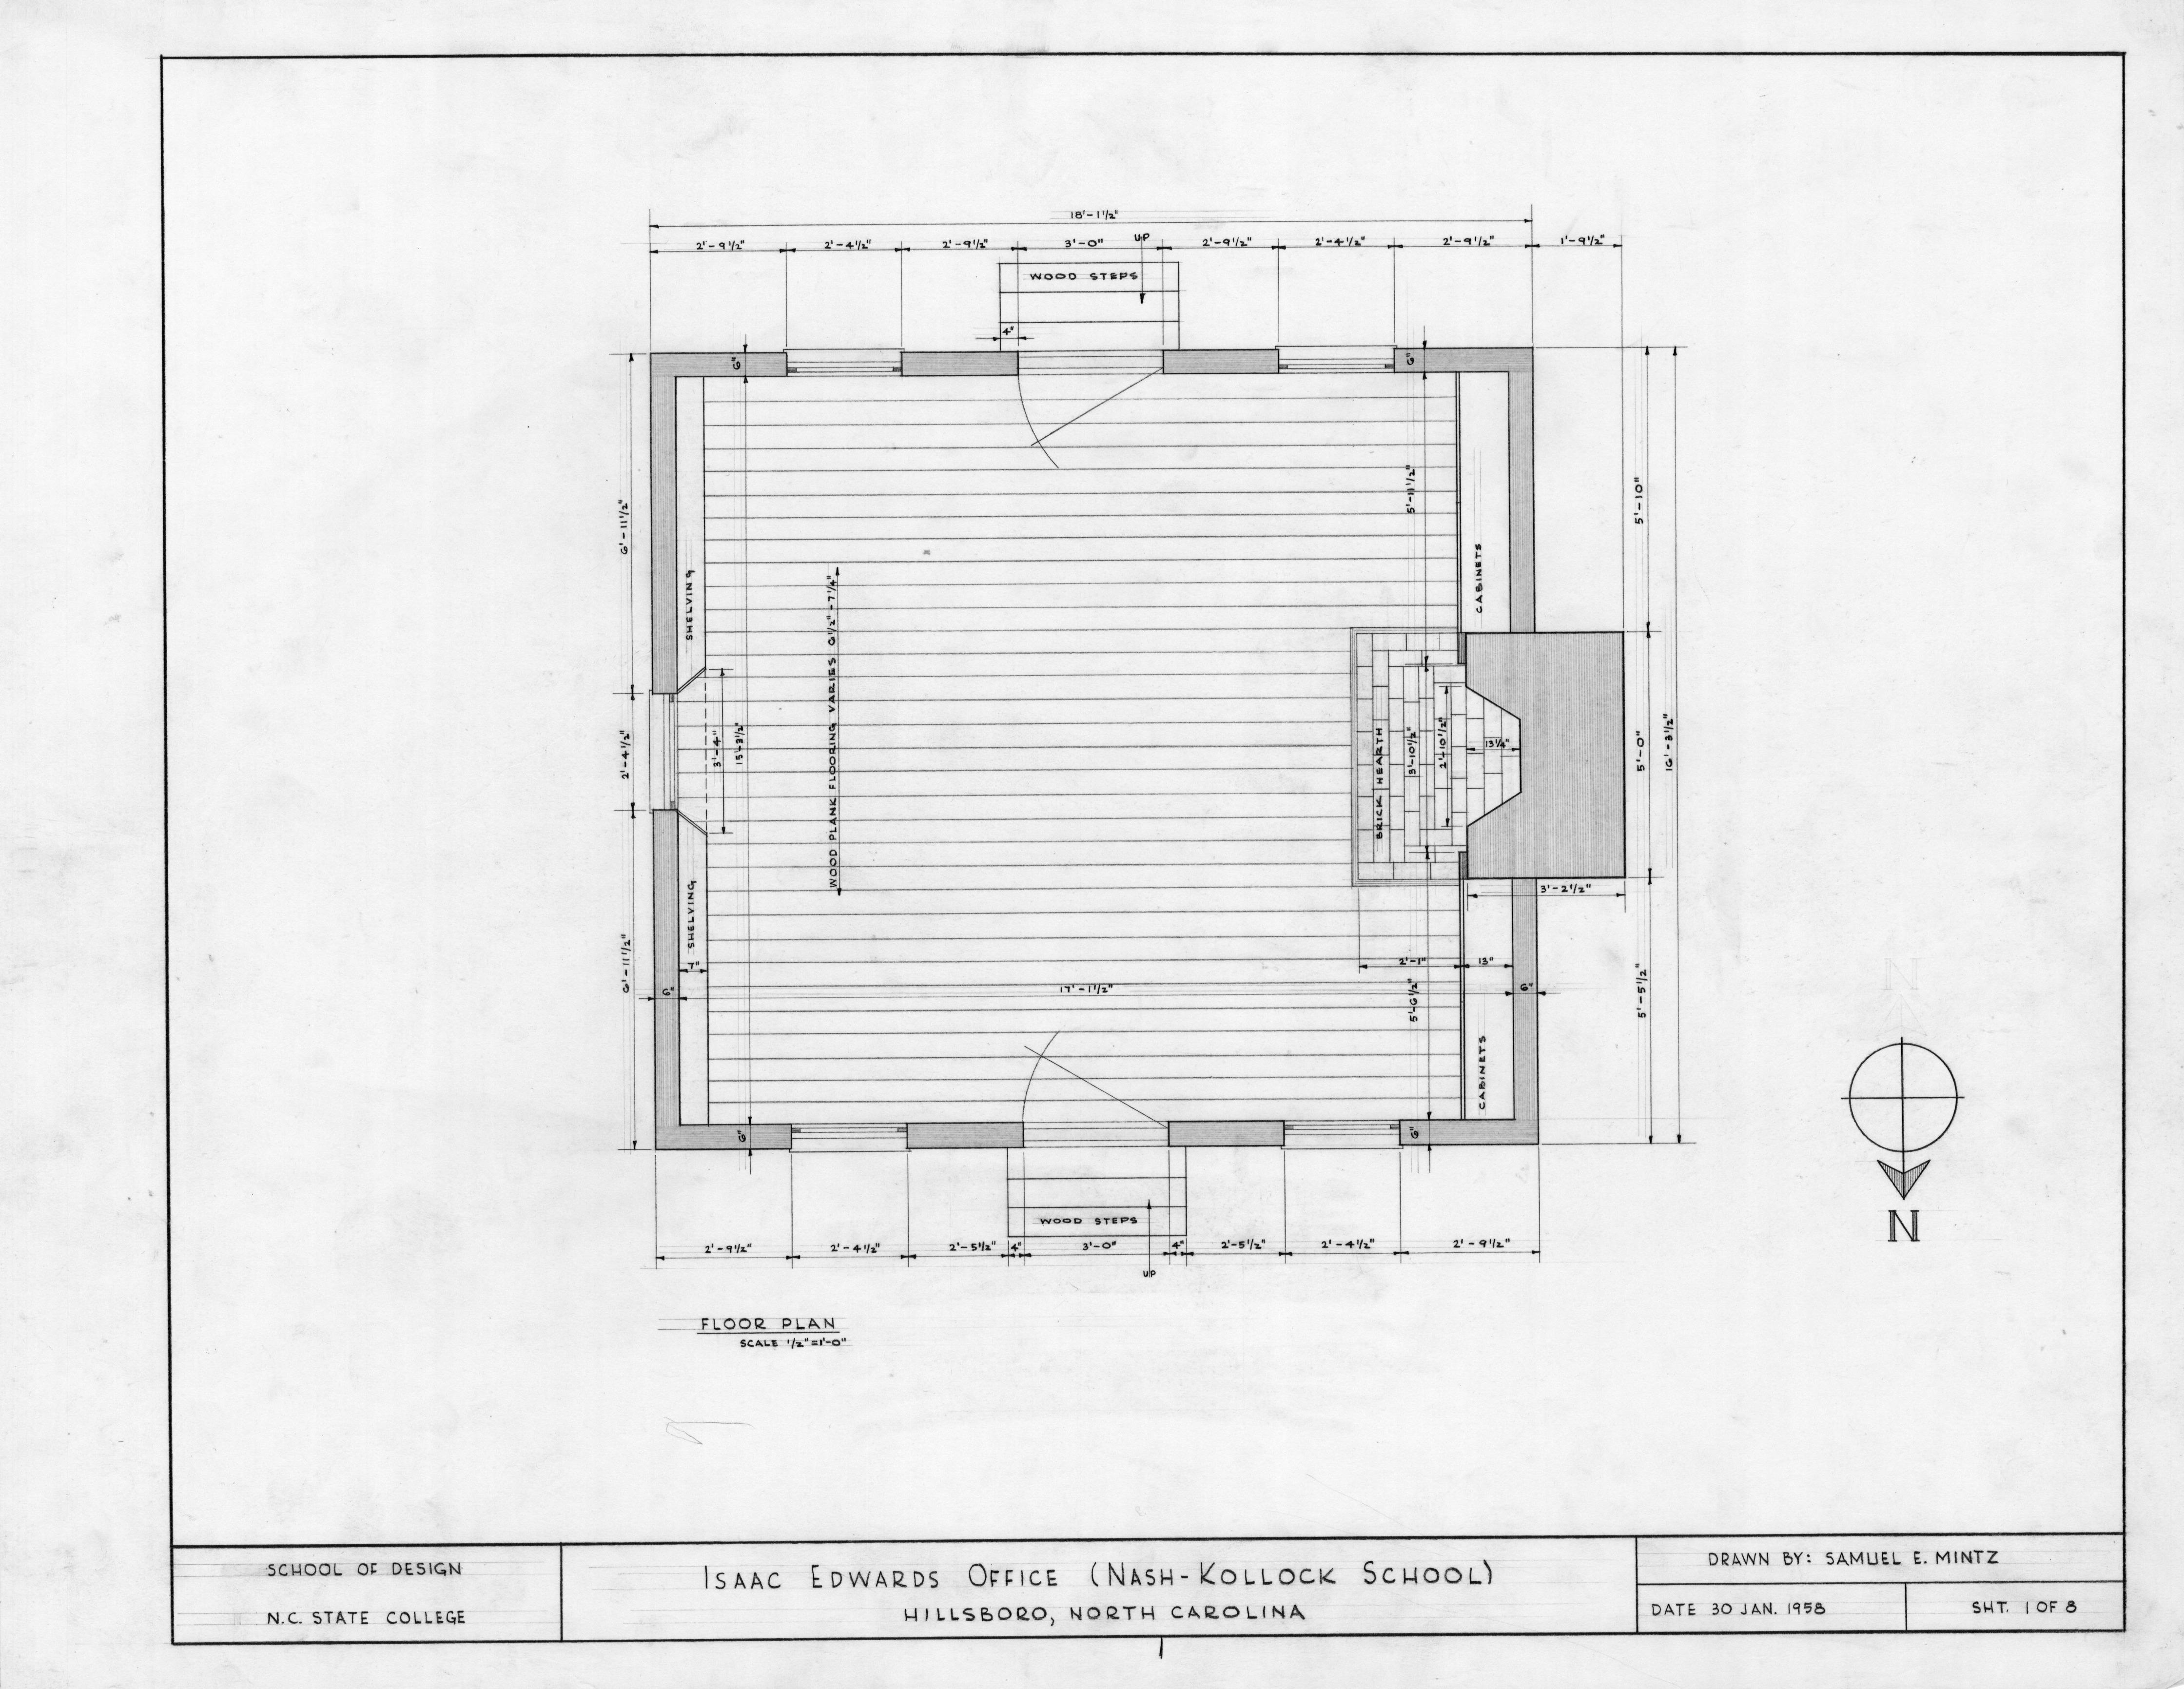 Law Office Floor Plan: Floor Plan, Cameron-Nash Law Office, Hillsborough, North